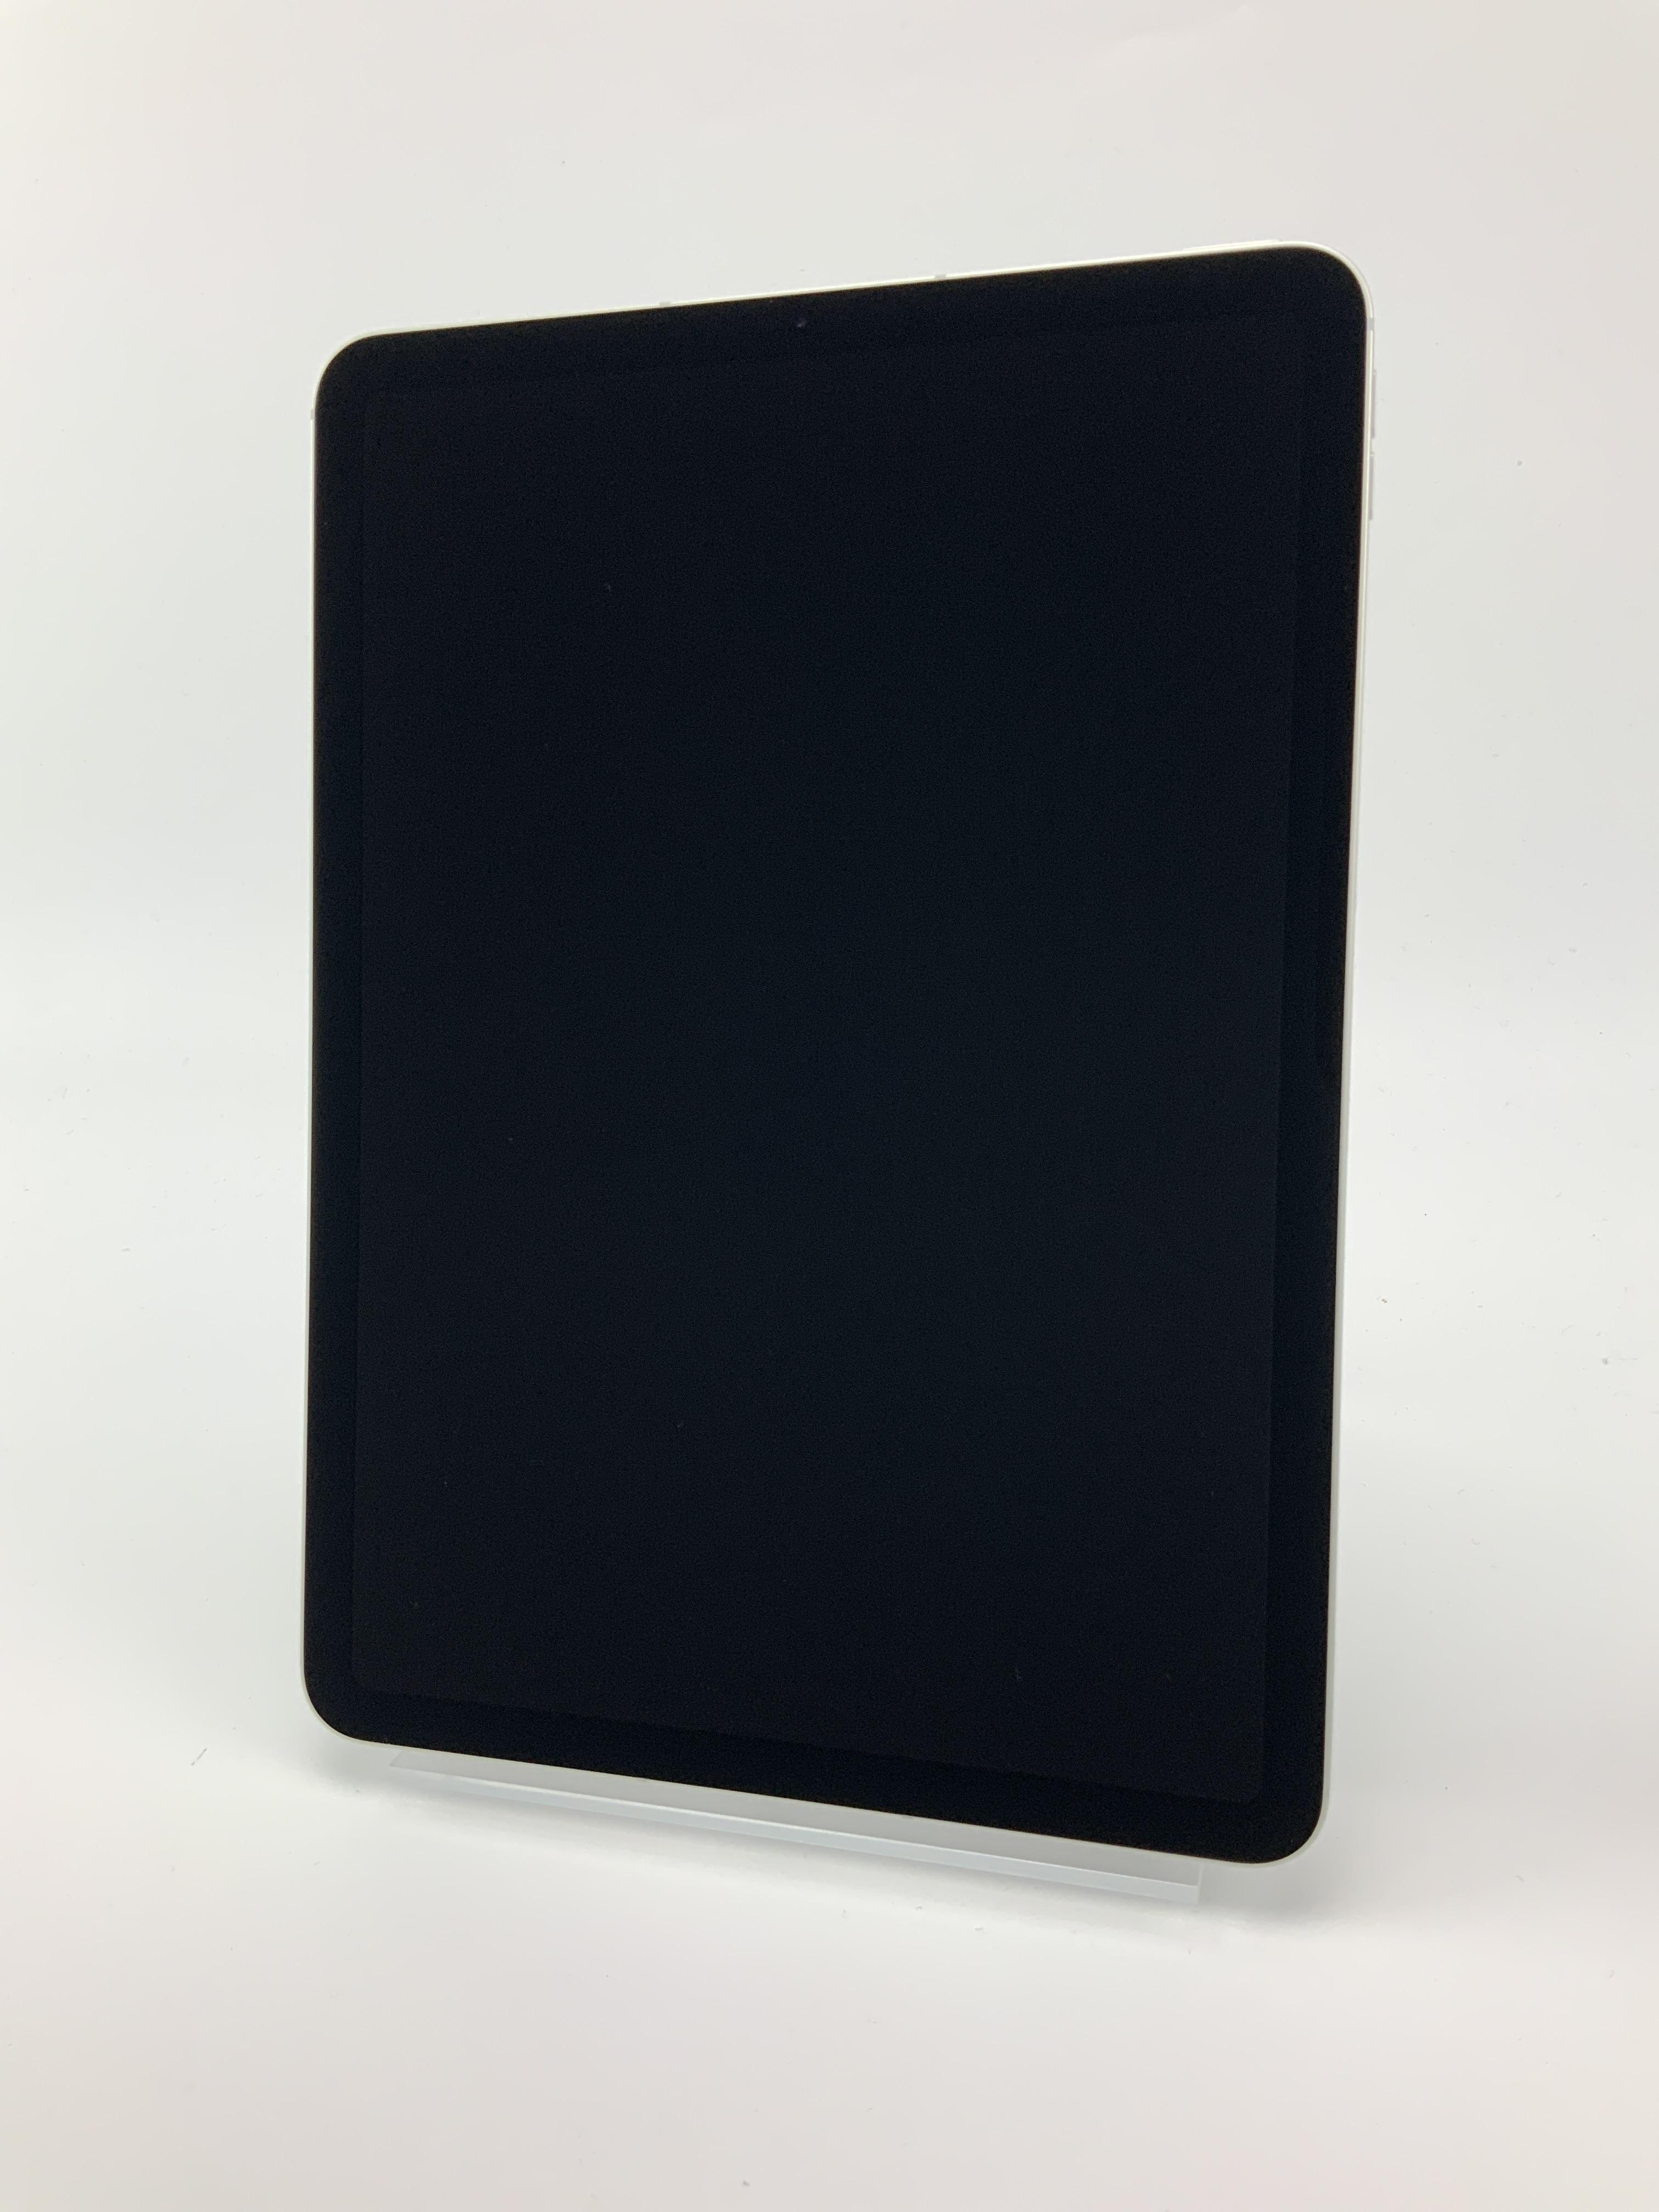 iPad Air 4 Wi-Fi + Cellular 64GB, 64GB, Silver, Bild 1